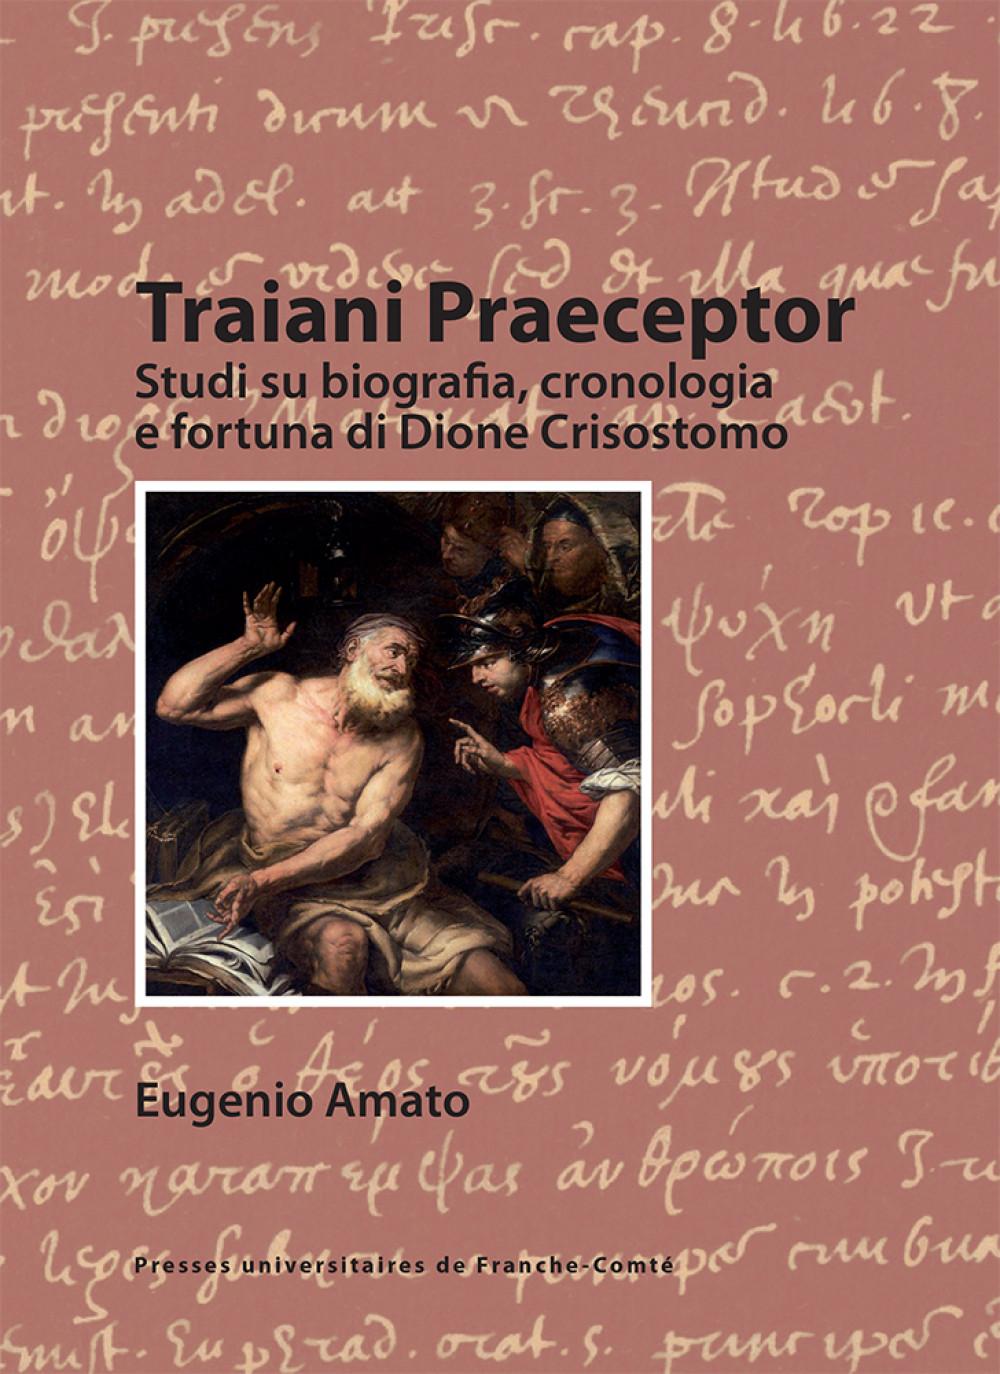 <i>Traiani Praeceptor</i>